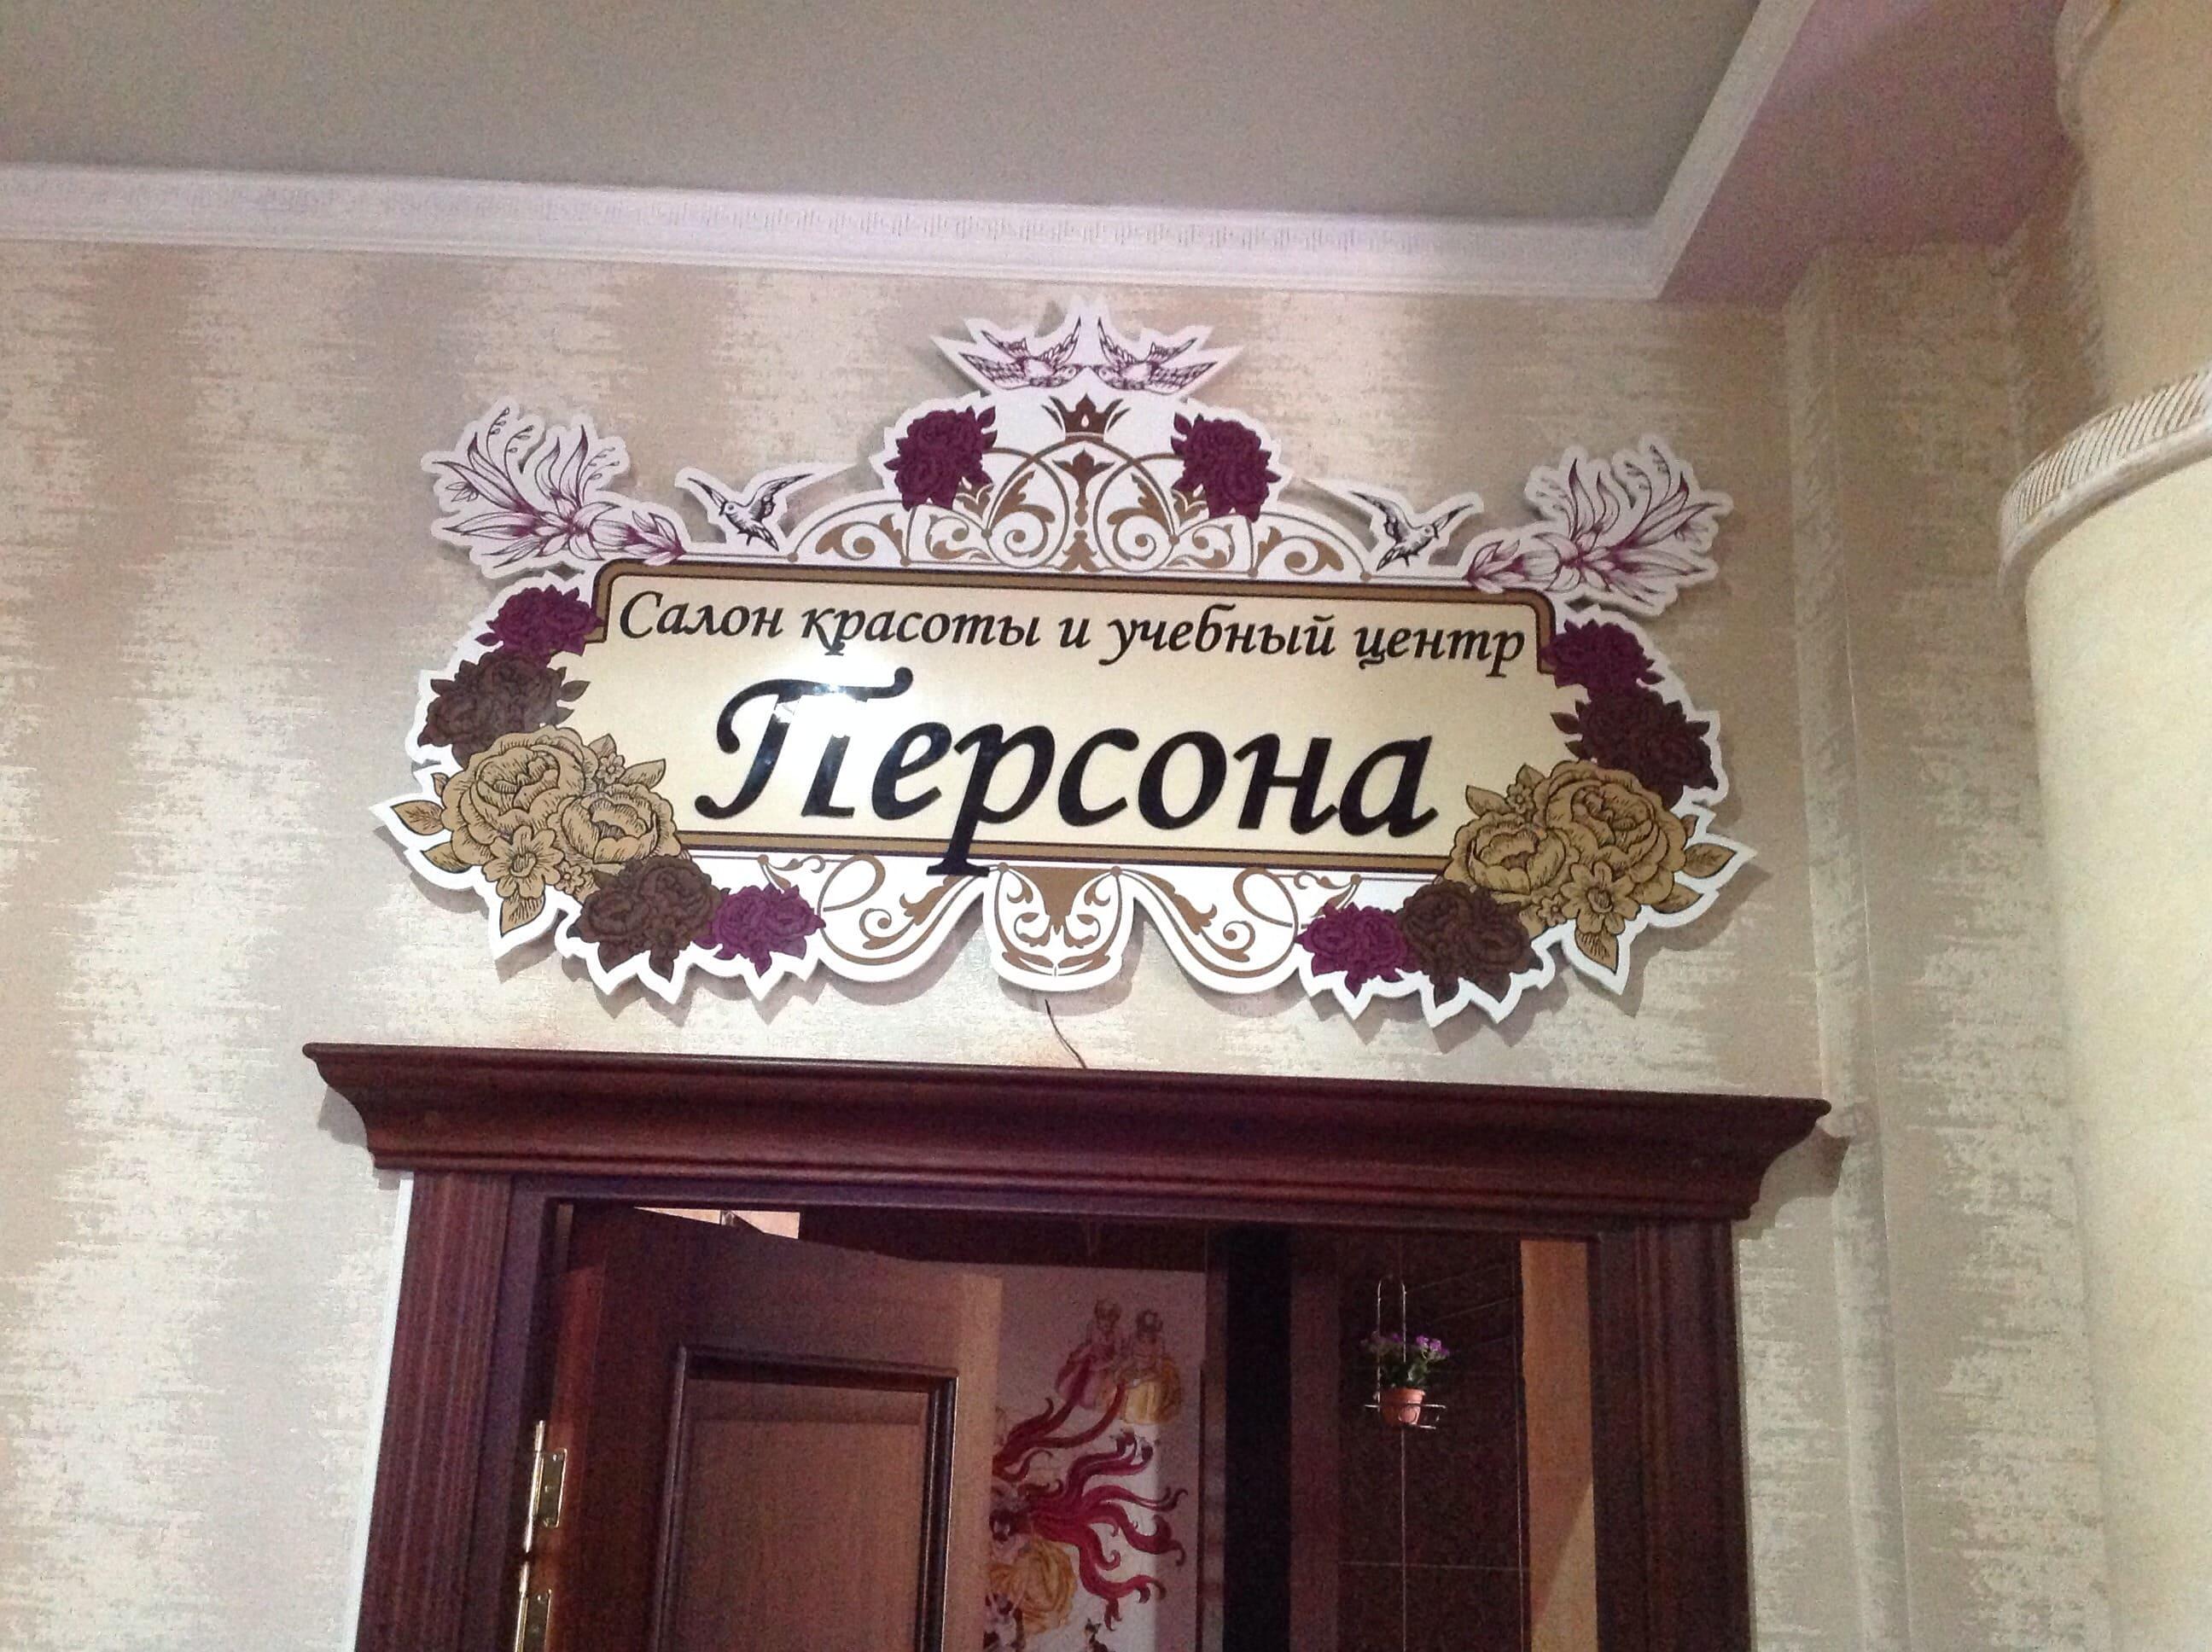 corporate designs artkatana kateryna fedorova design for restaurant bar spa beauty salon катерина федорова дизайнер